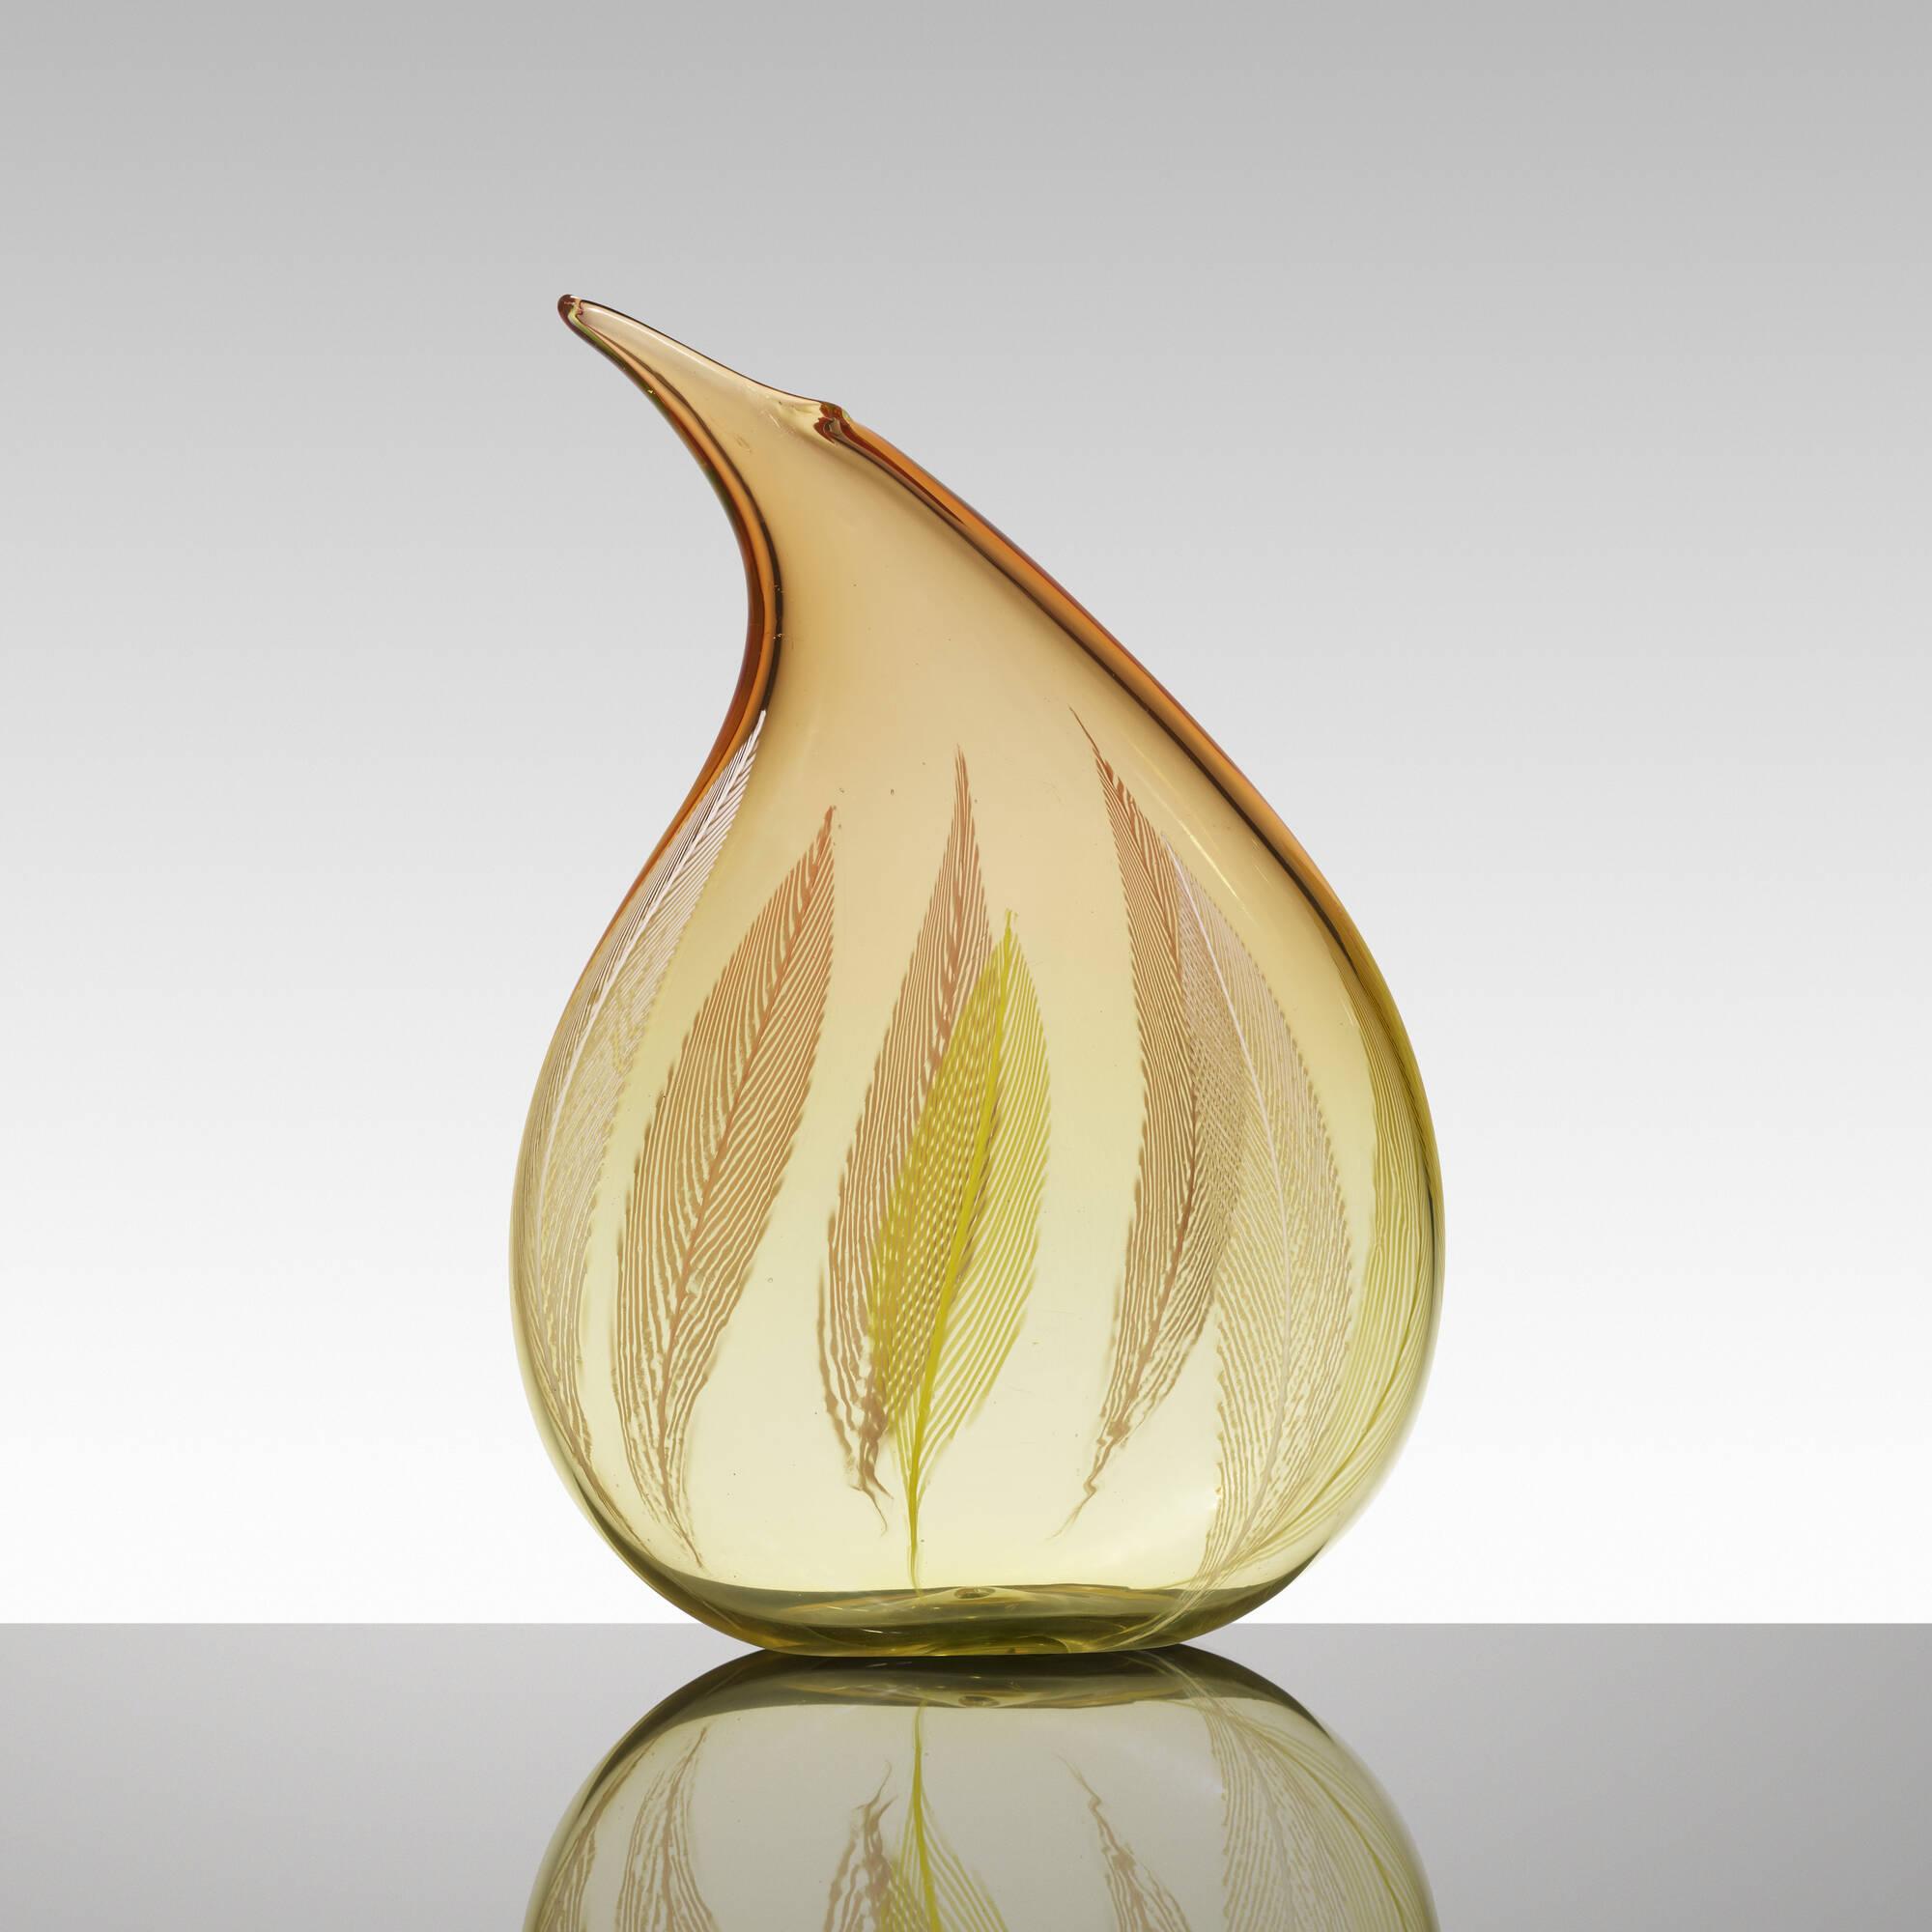 168: Archimede Seguso / A Piume vase (1 of 3)